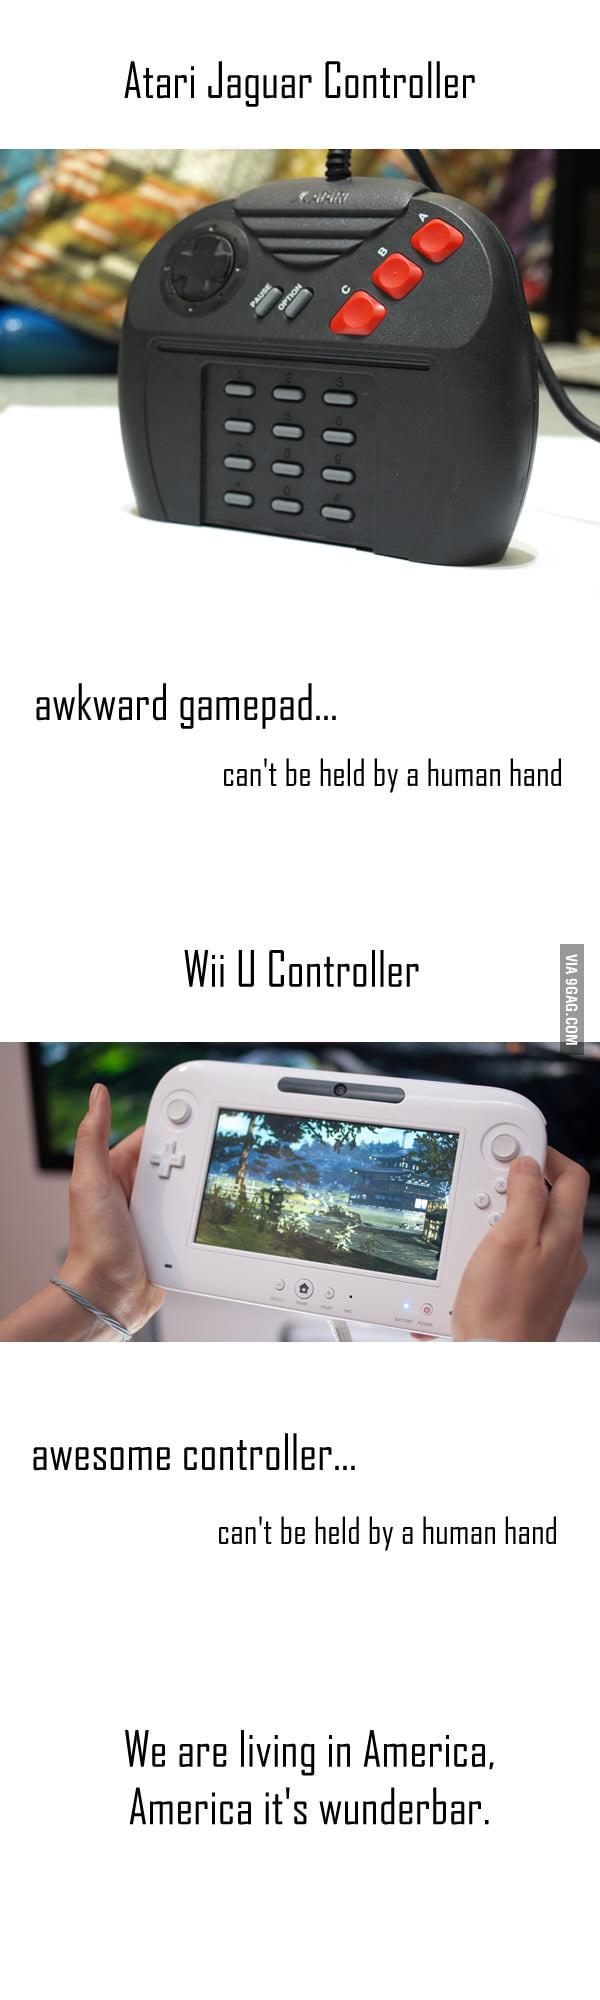 Controller wars